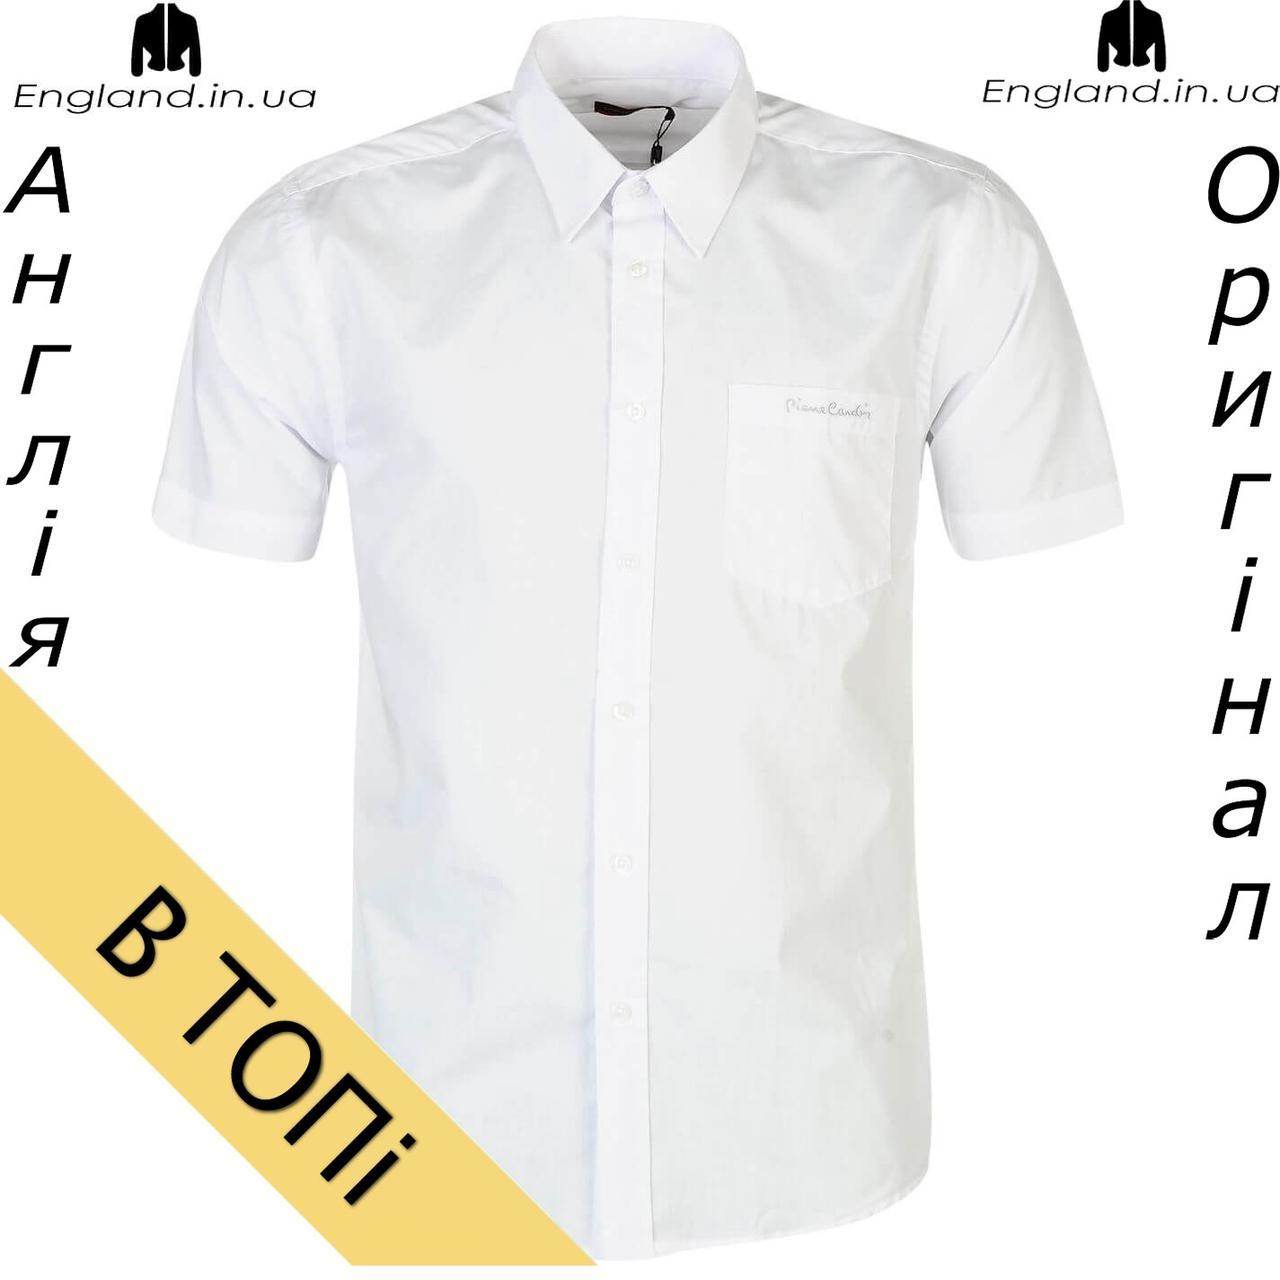 Рубашка мужская Pierre Cardin белая летняя на короткий рукав